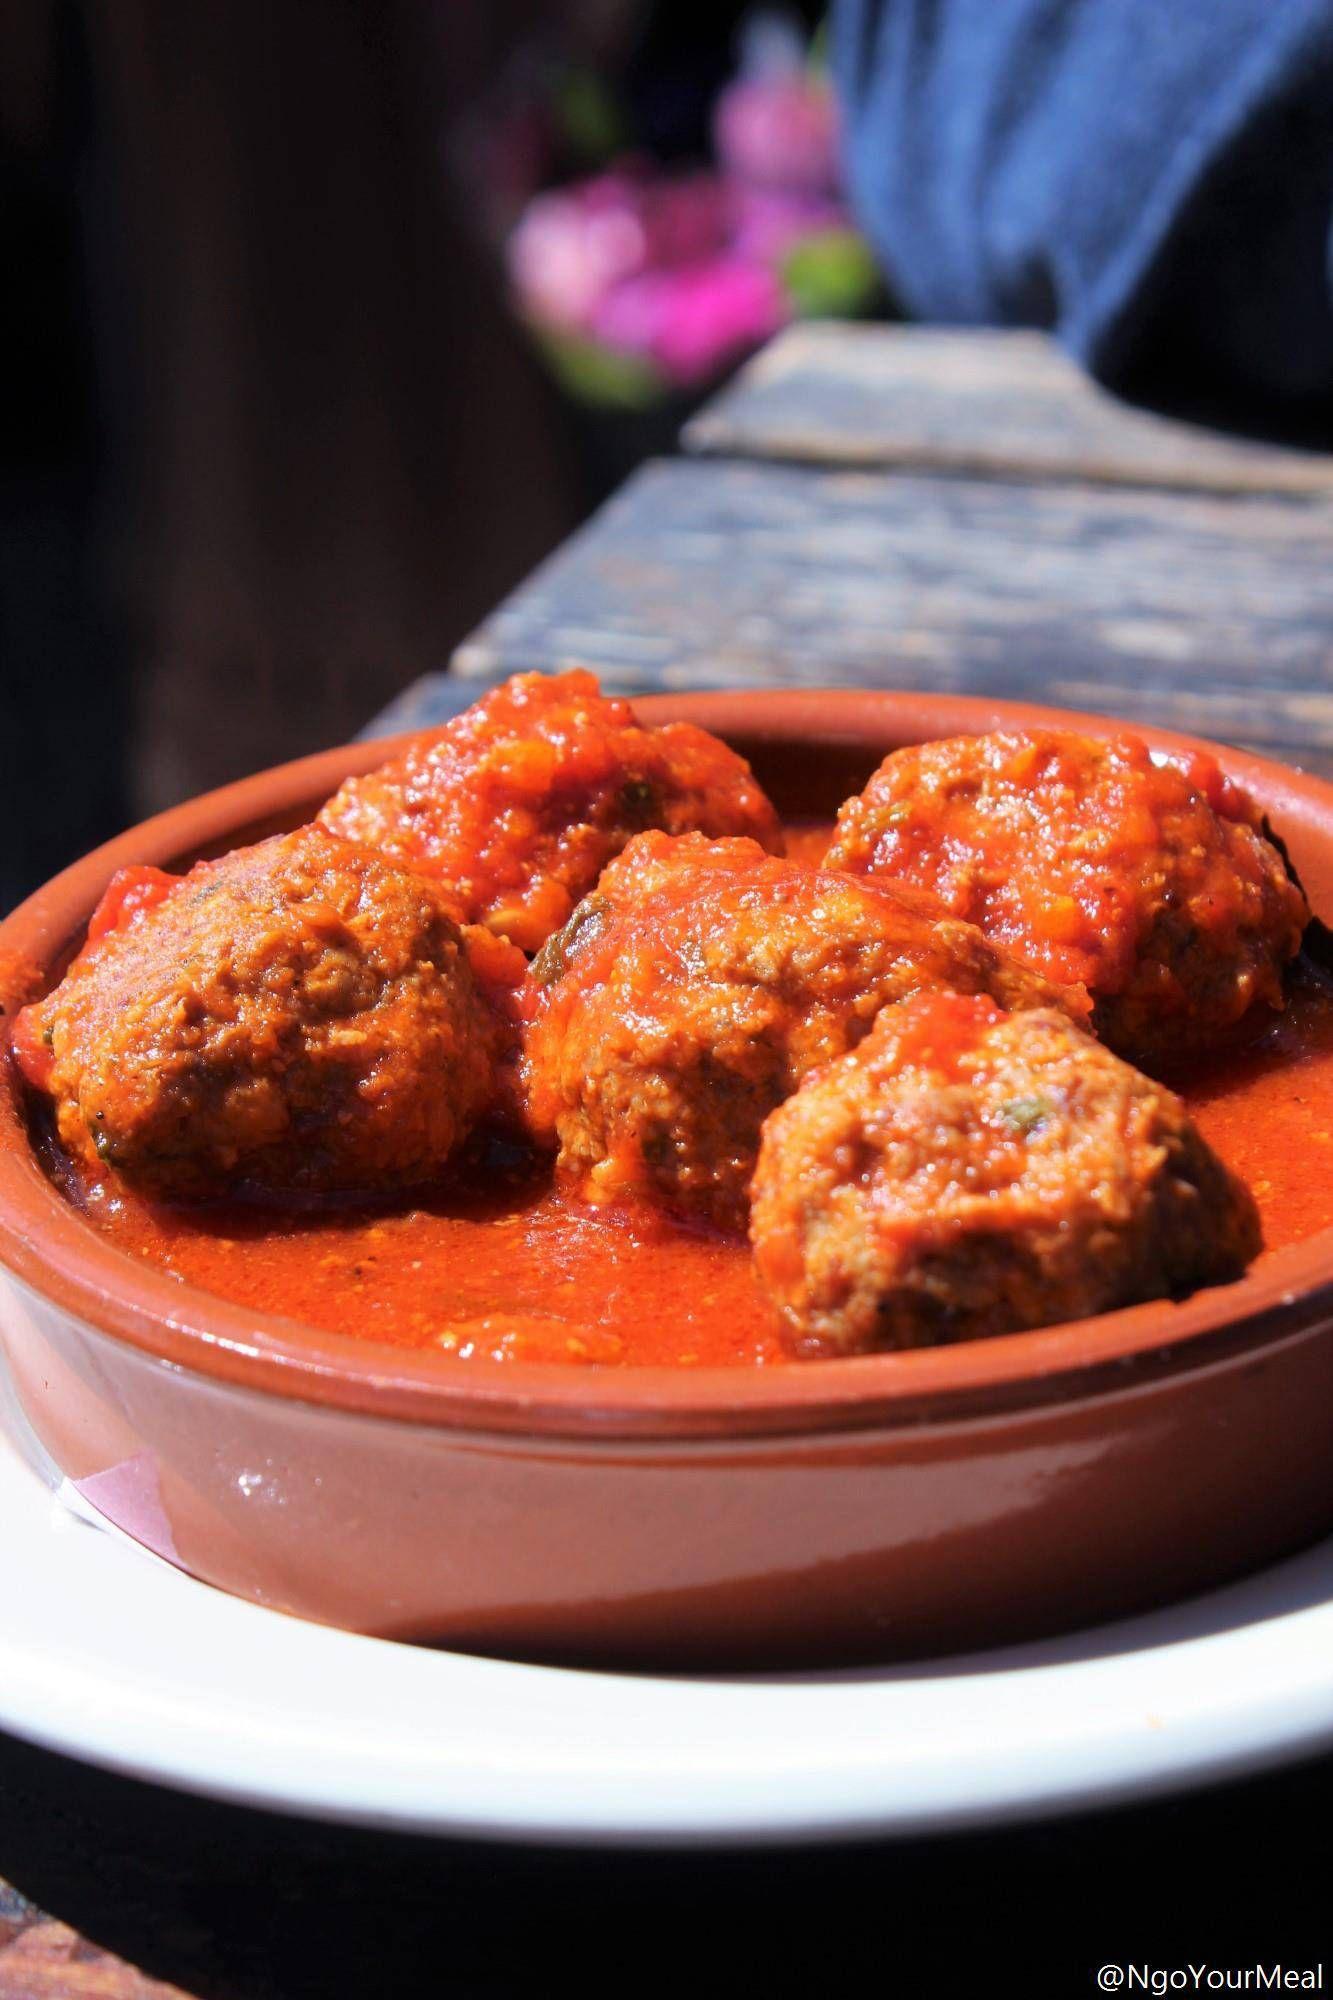 Albondigas Spiced Meatballs In Jamon Tomato Sauce At Barcelona Wine Bar In Boston Barcelona Wine Bar Meals Cured Meats